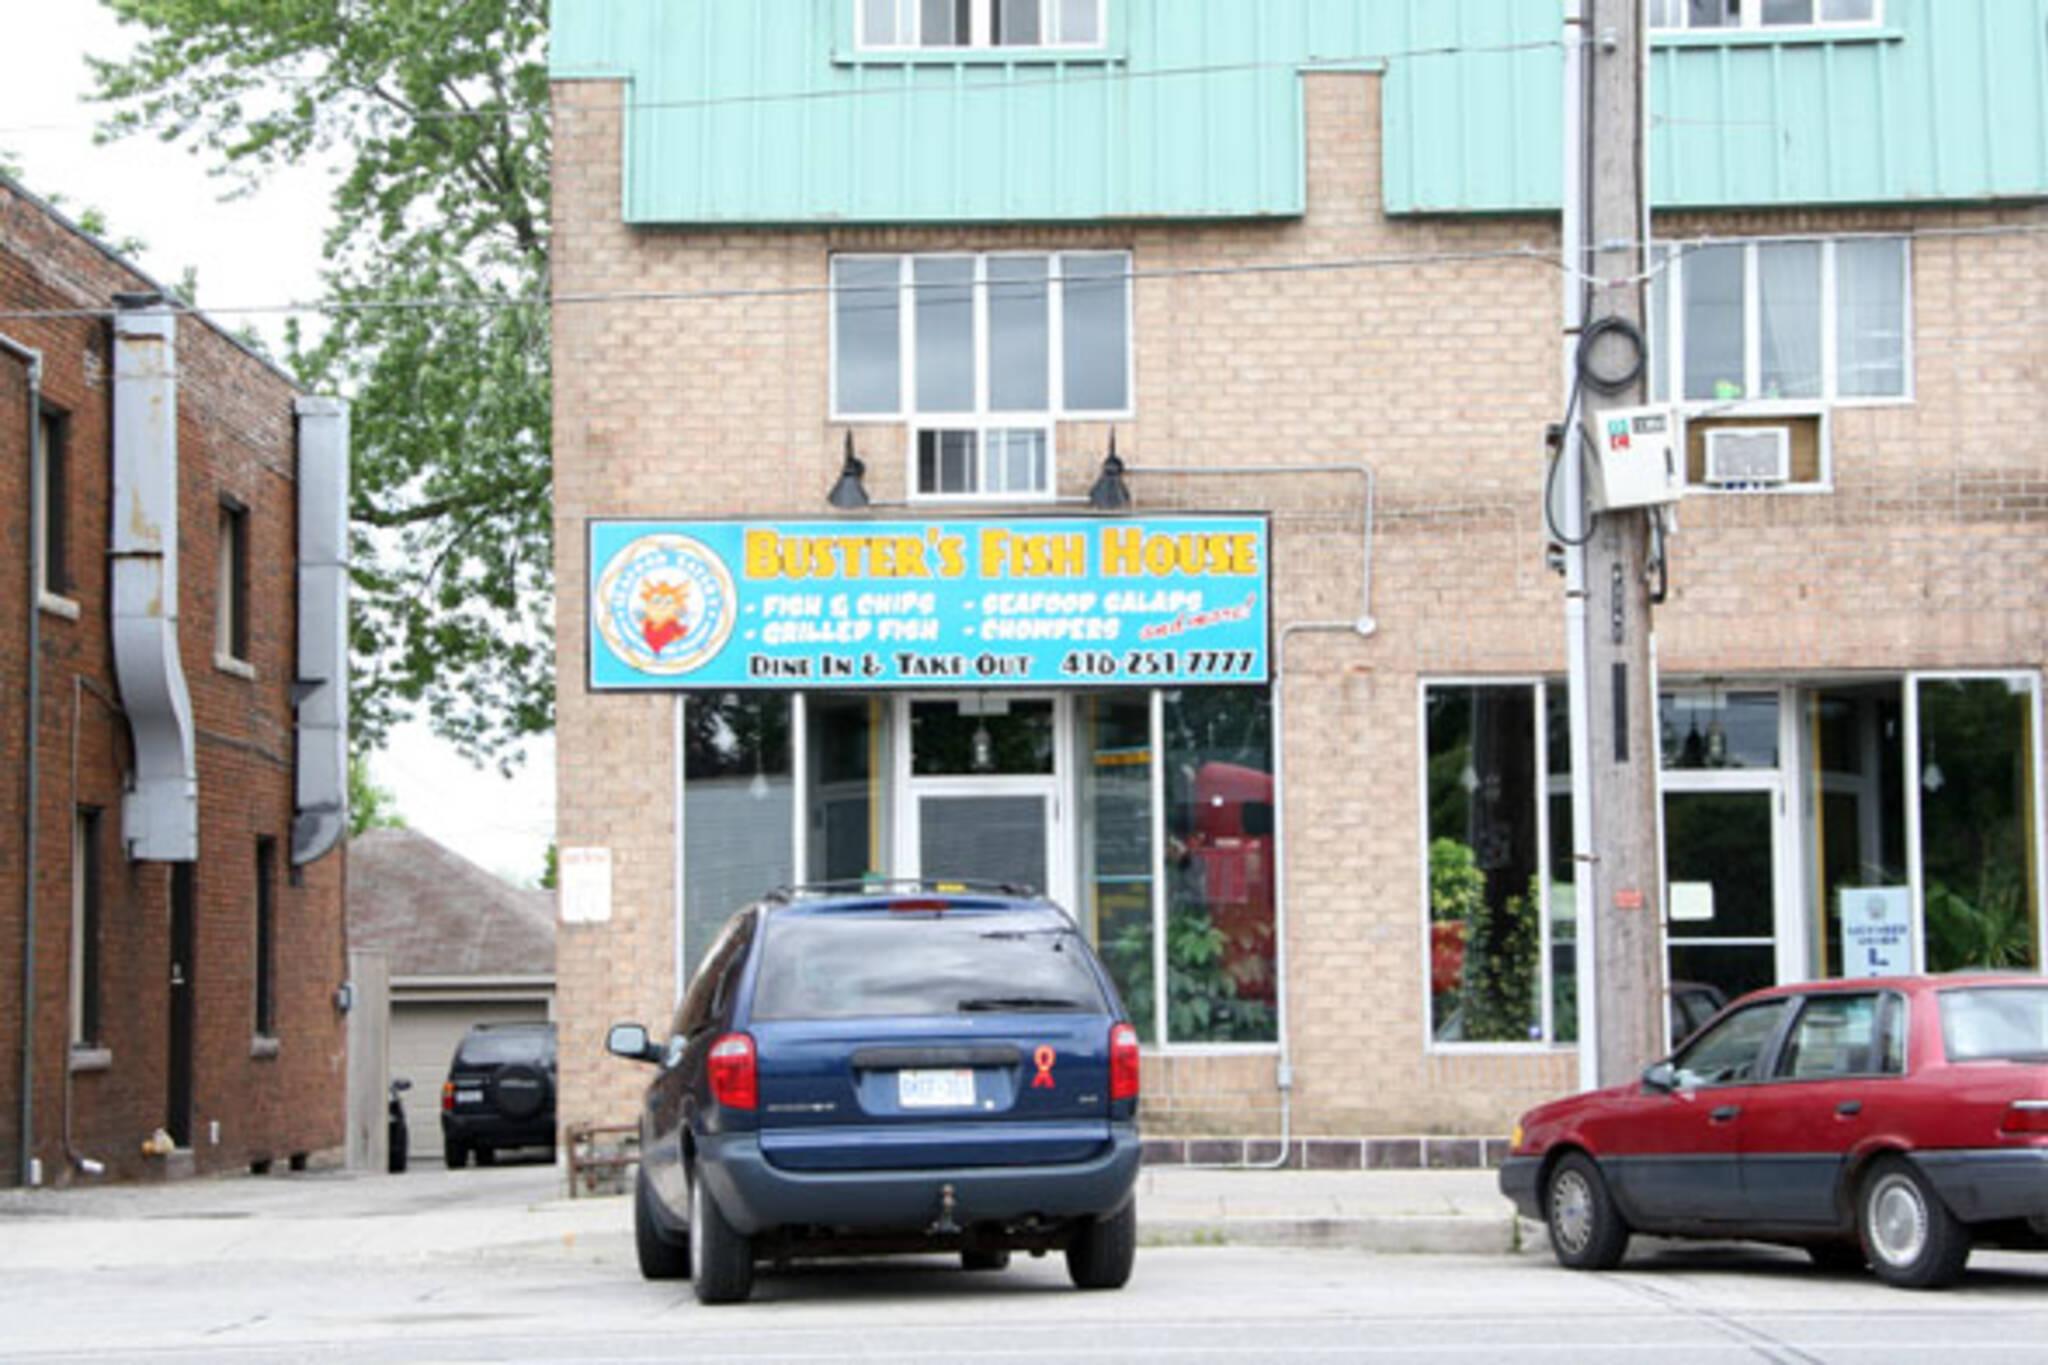 Buster's Fish House Toronto